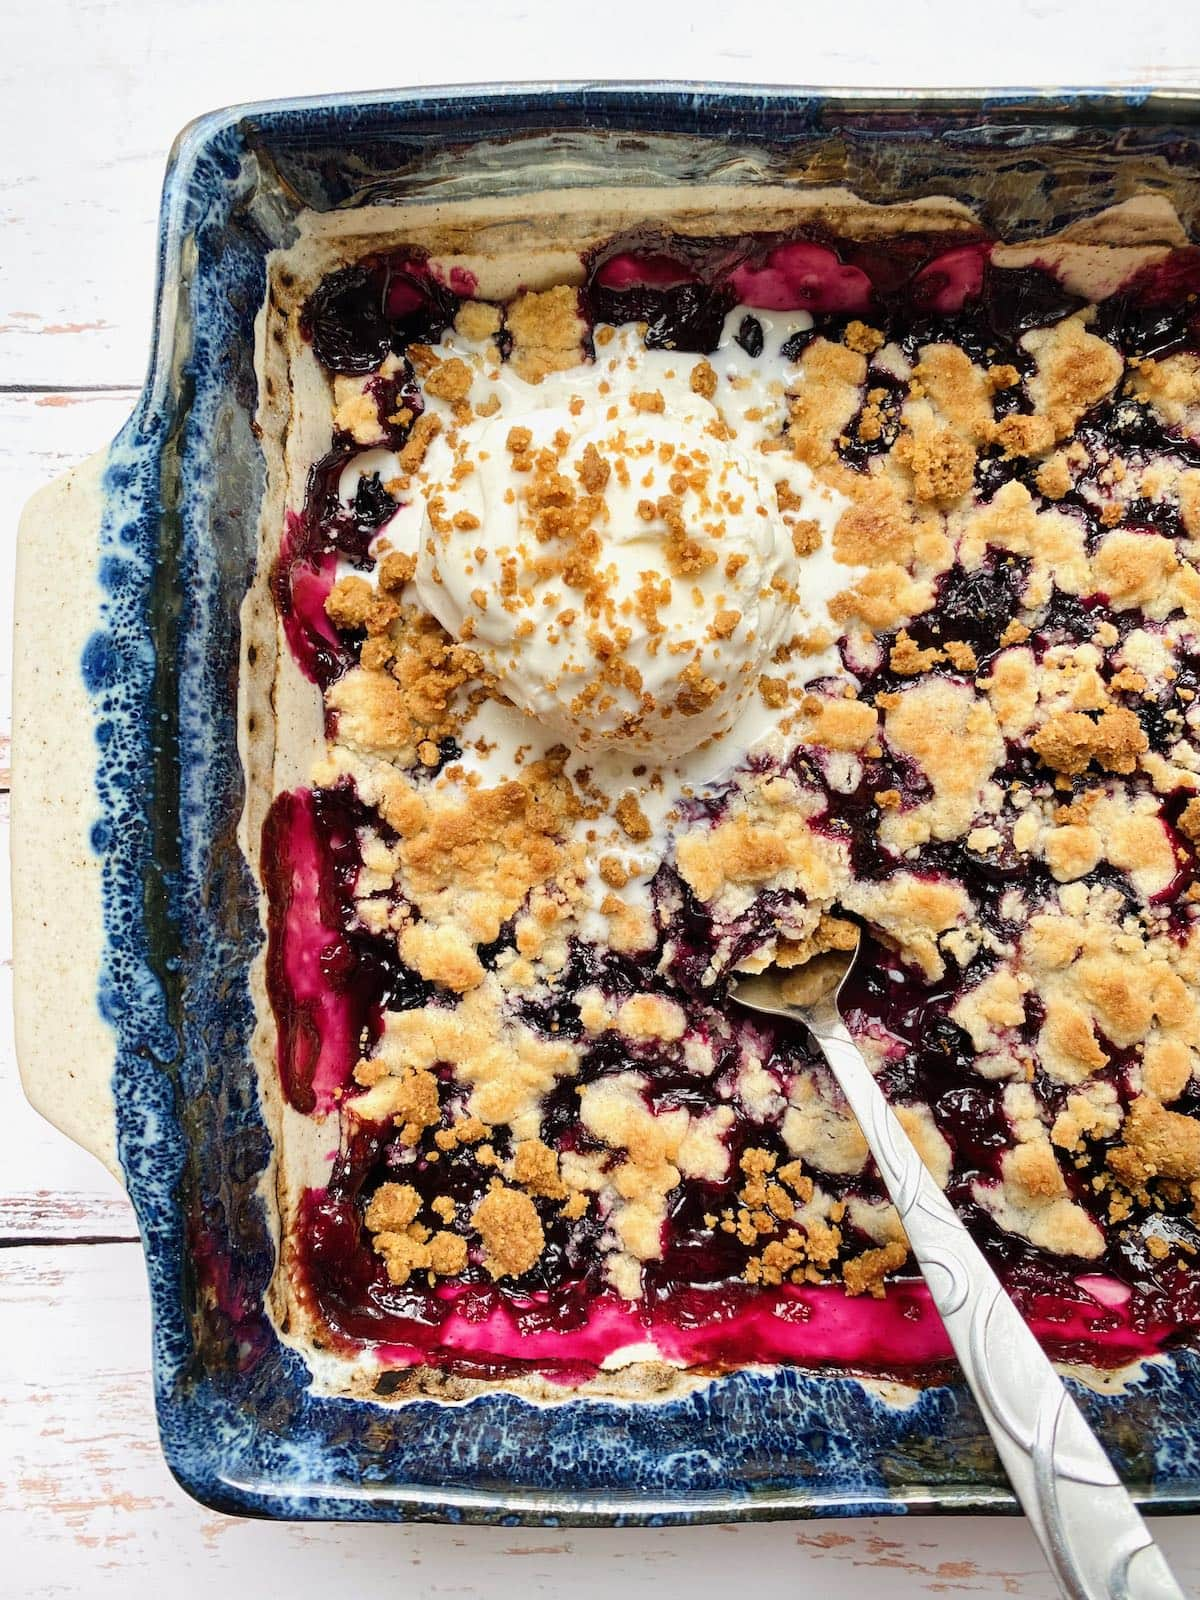 scoop of vanilla ice cream on top of blueberry cobbler.